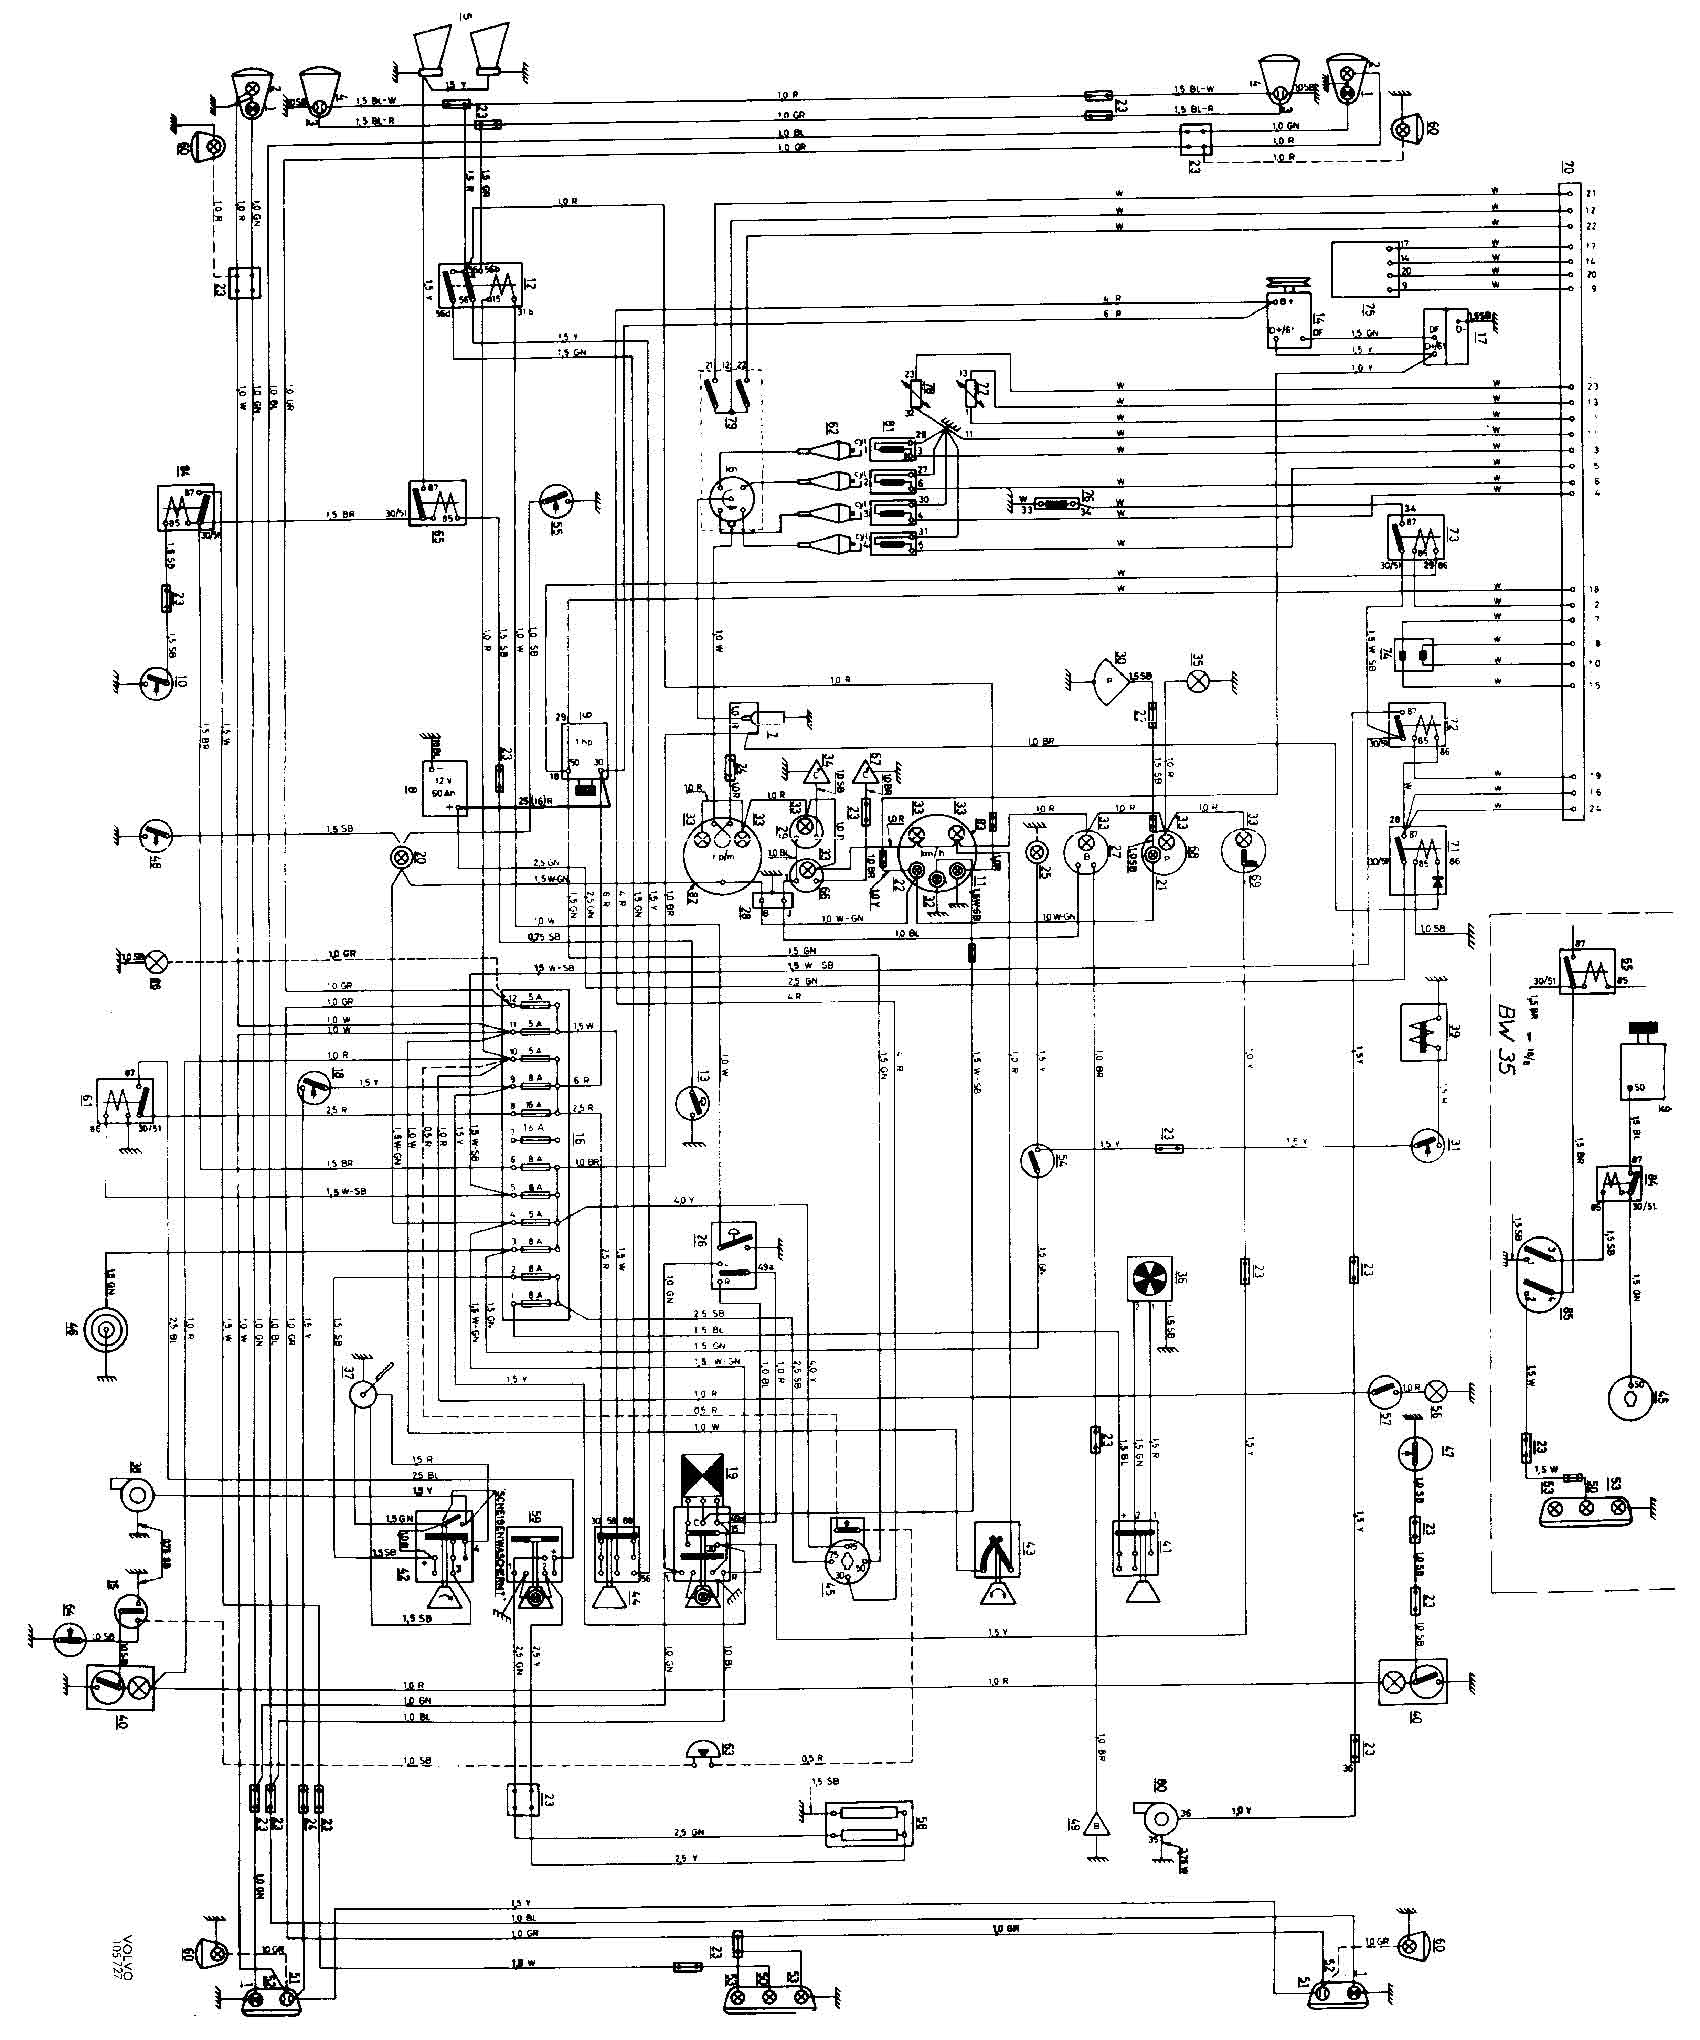 2001 volvo truck ac wiring diagram